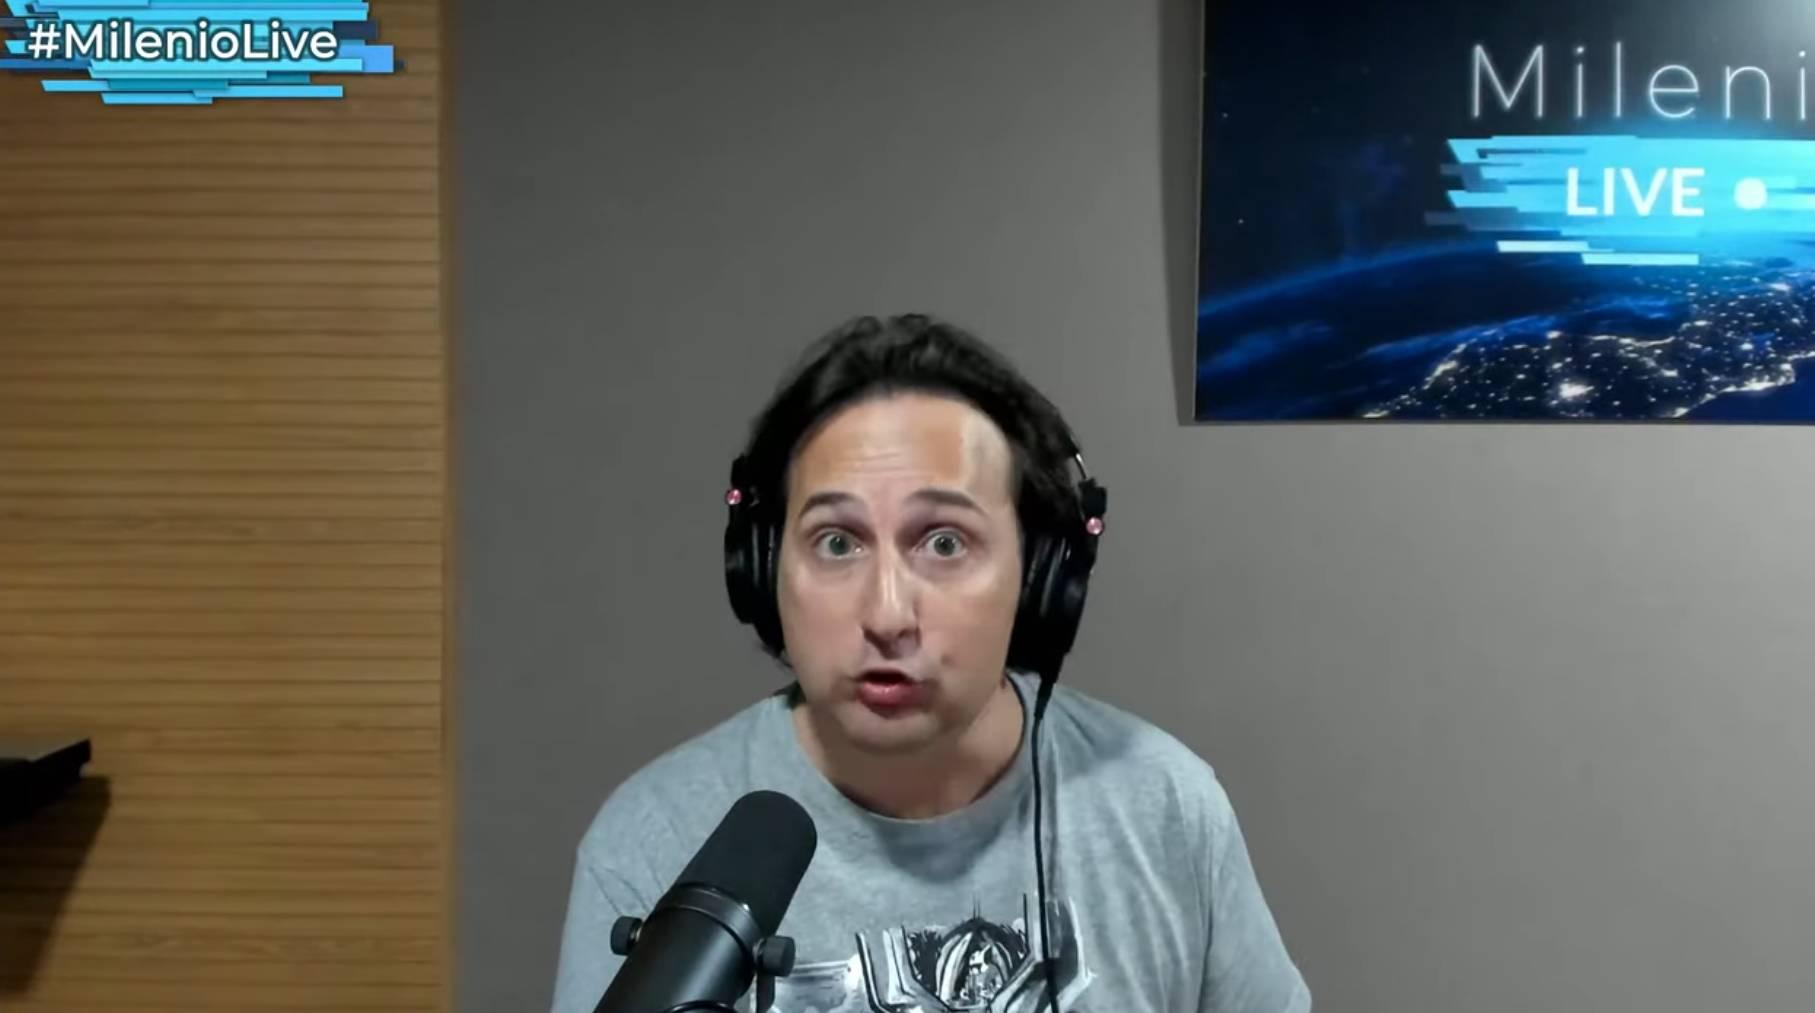 Iker Jiménez Évole